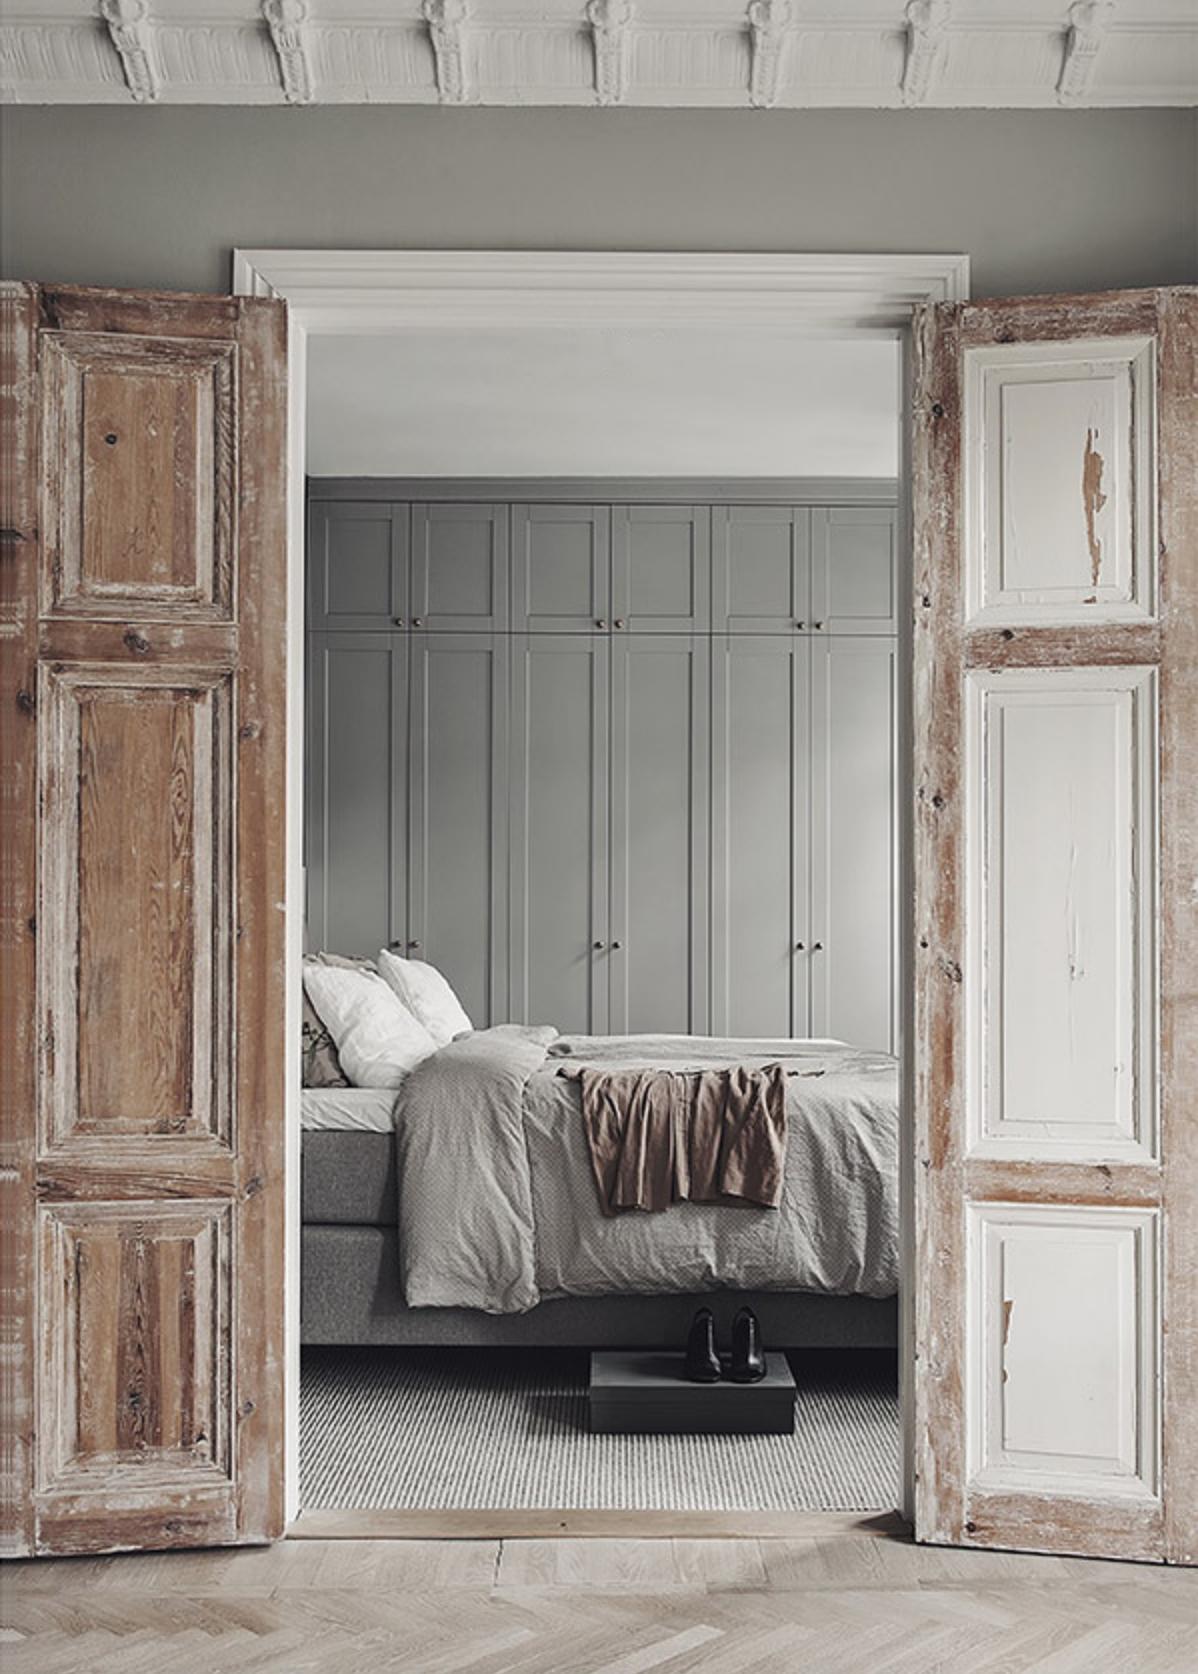 where of sliding organization door custom full wooden to size doors closet bedrooms hack buy modern ikea prices wardrobe for ideas bifold mirror